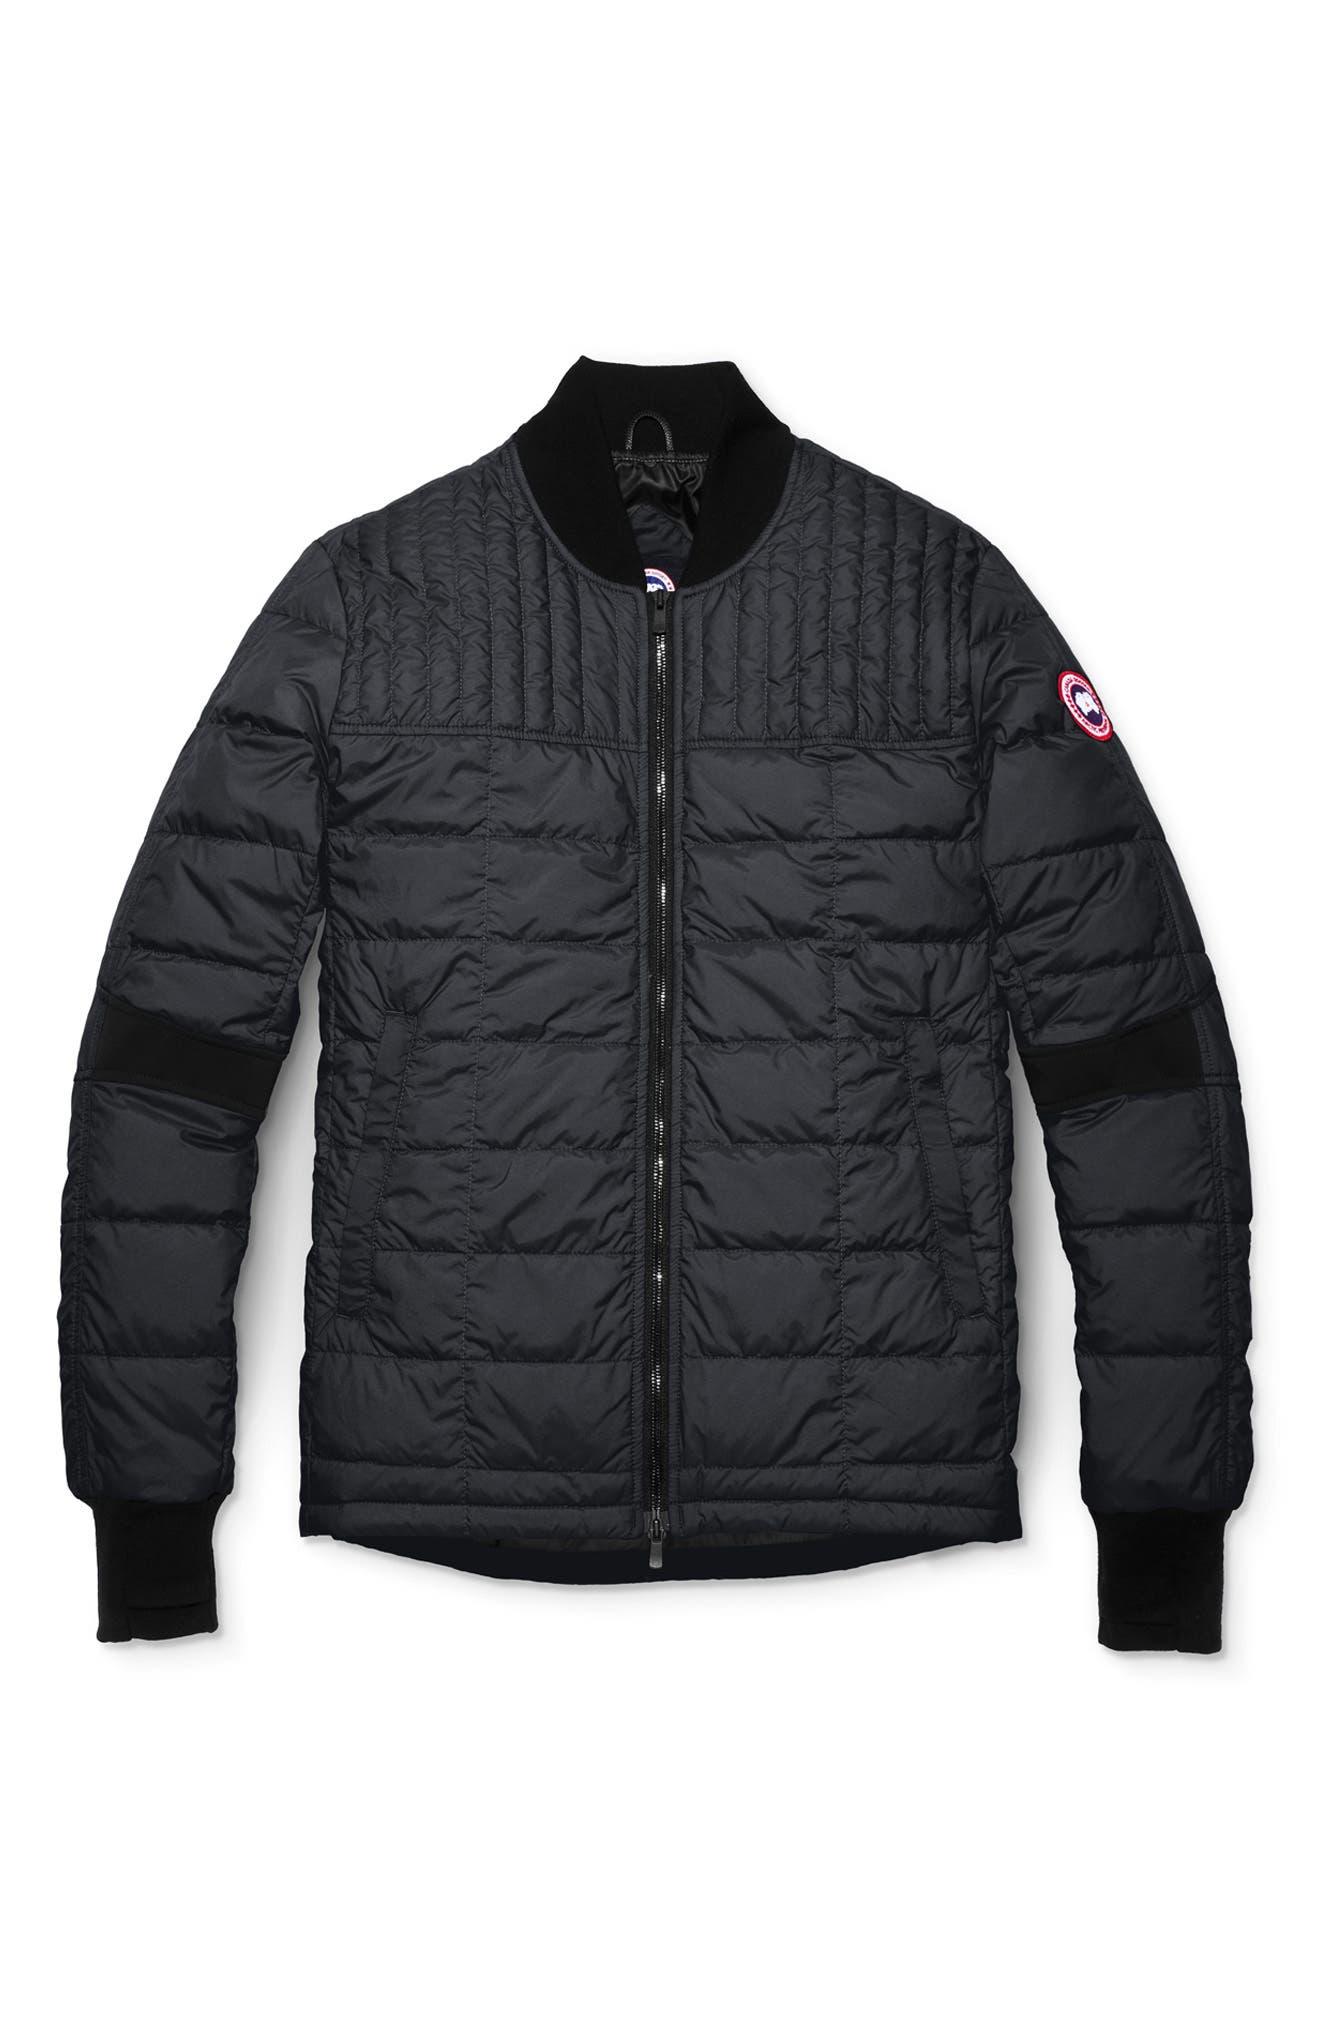 CANADA GOOSE Dunham Slim Fit Packable Down Jacket, Main, color, 001